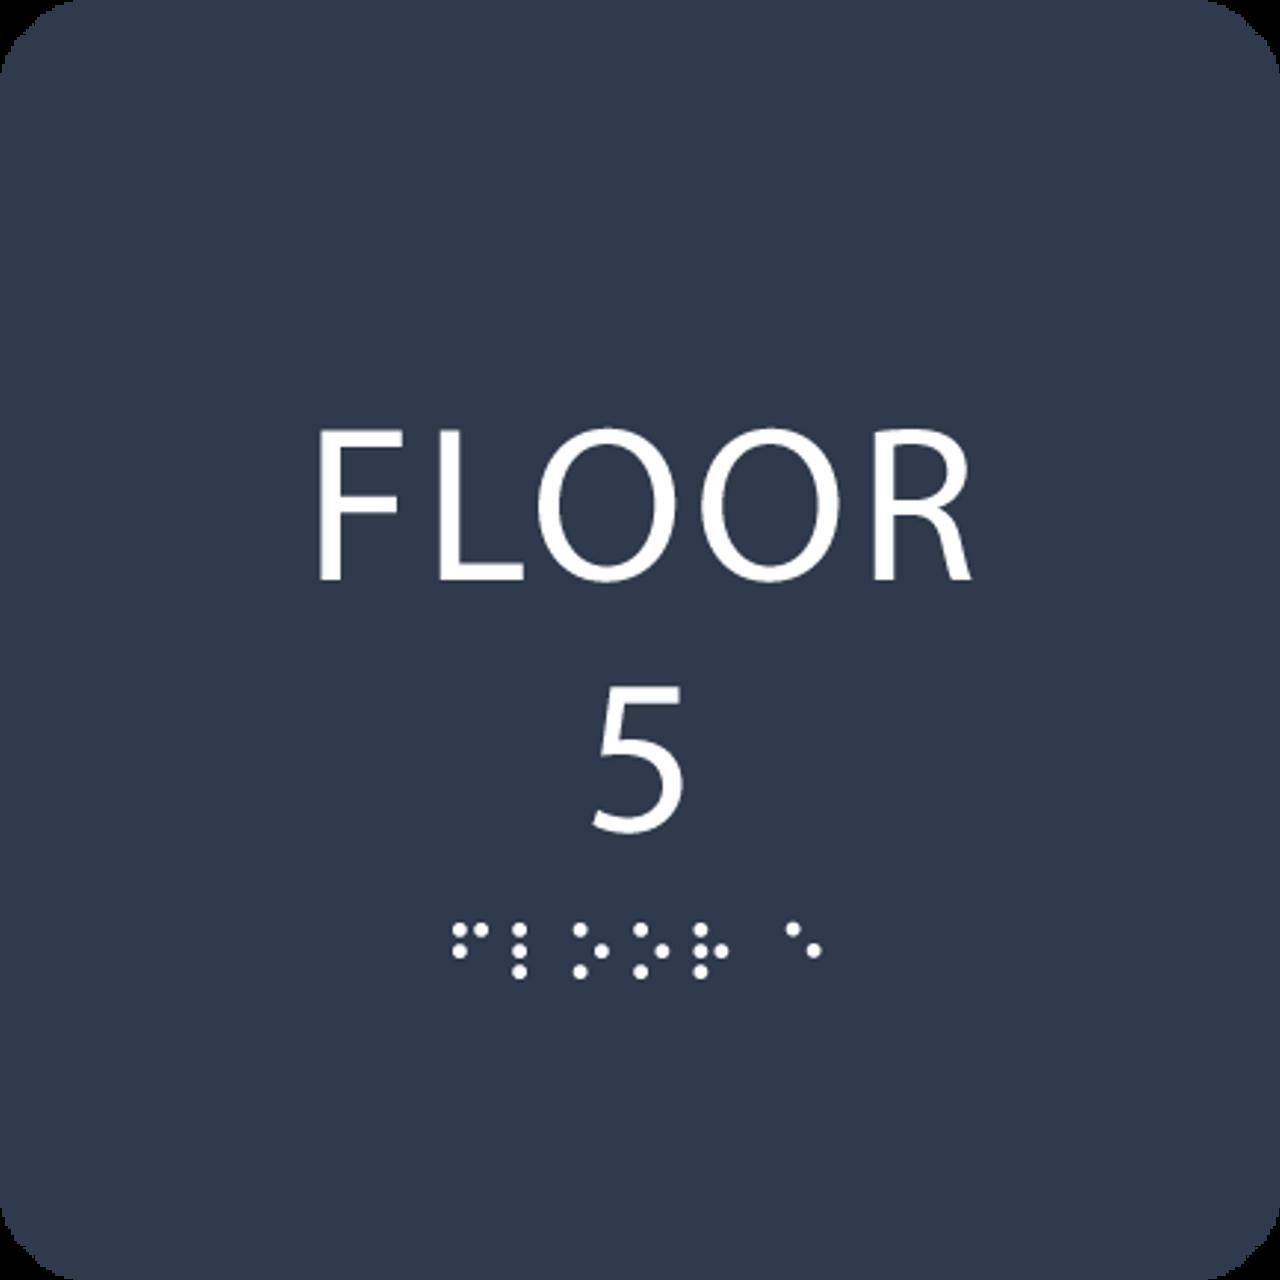 Navy Floor 5 Level Identification Sign